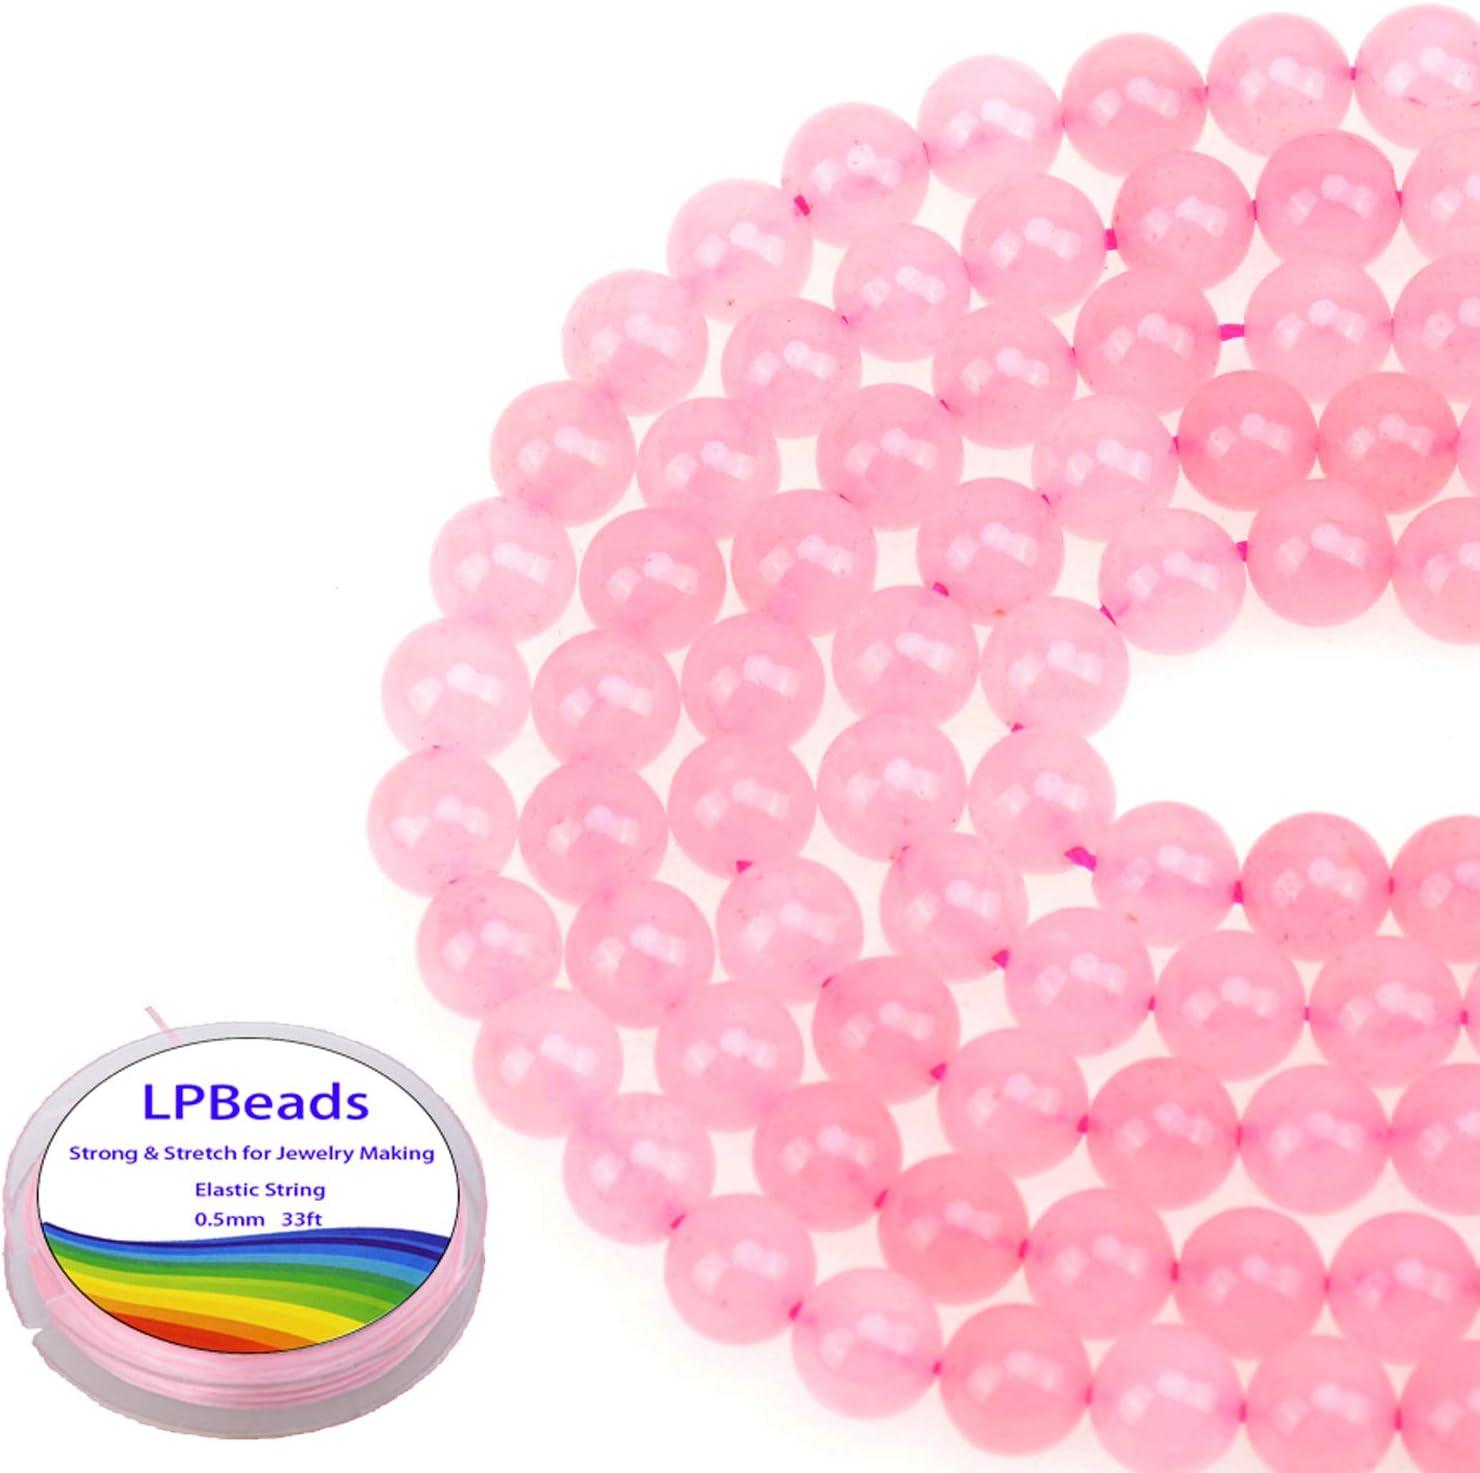 8 Inches ROSE QUARTZ CARVED Melon Shape Natural Gemstone Carving Center Drill Beads Line Genuine Quartz Beads Strand Reasonable Price